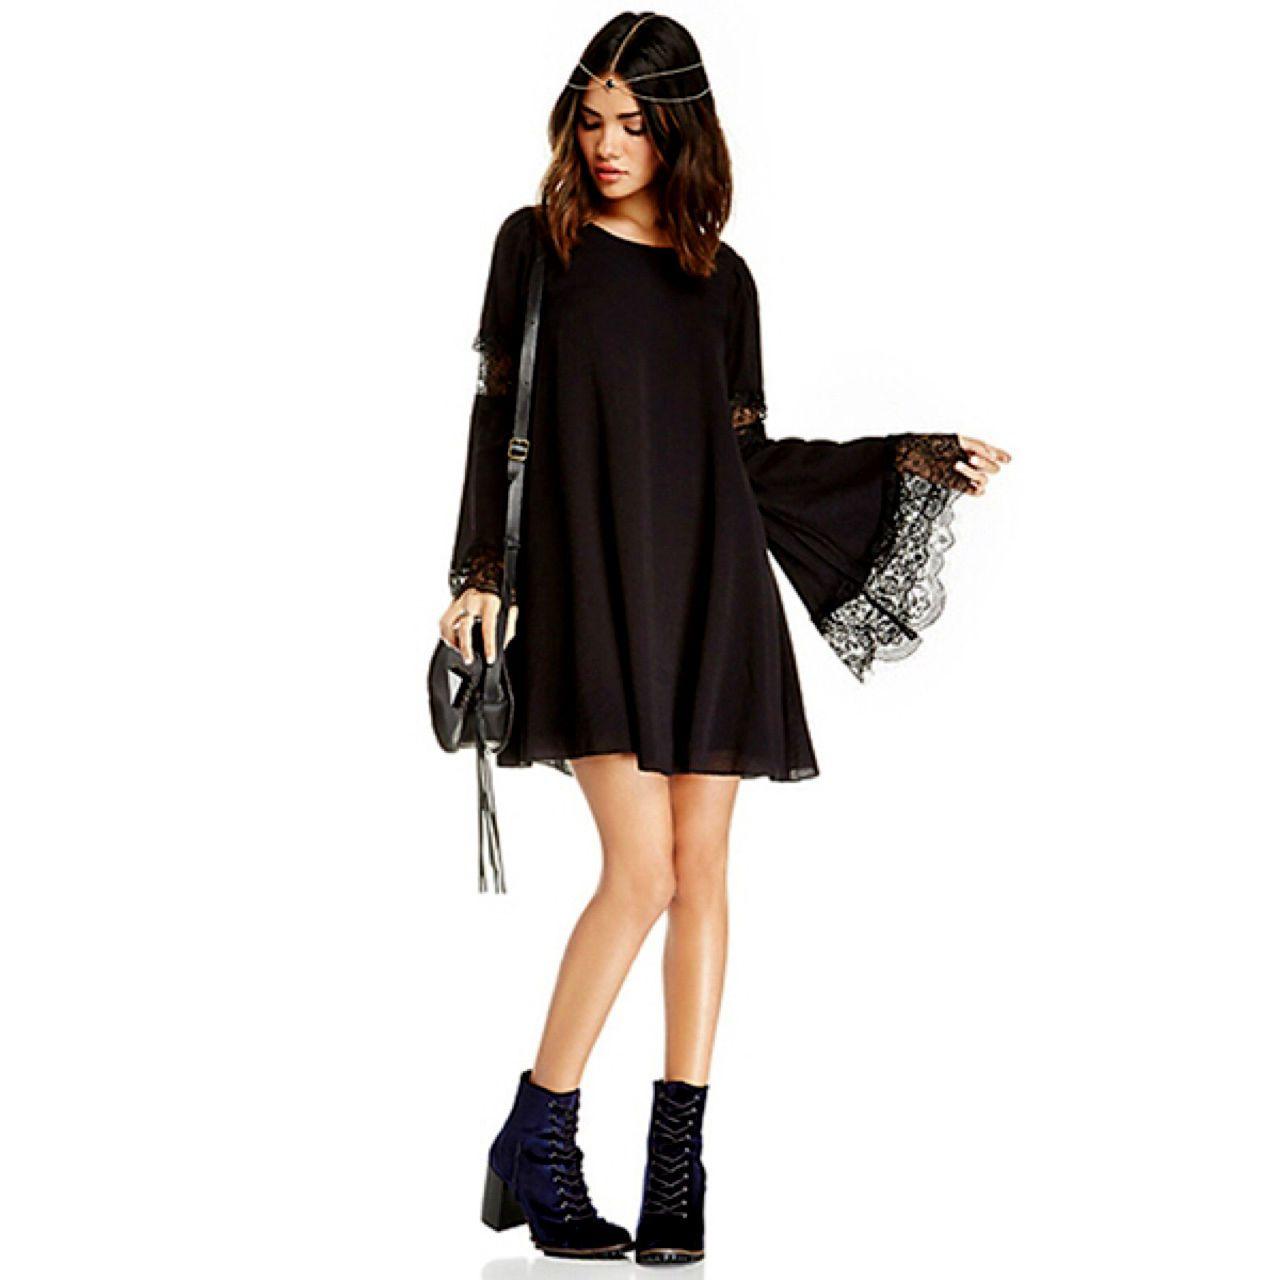 Isabella Black Lace Bell Sleeve Mini Dress Boho People Bohemian Free Hippie 30 0 Black Dress With Sleeves Lacy Black Dress Mini Dress [ 1280 x 1280 Pixel ]